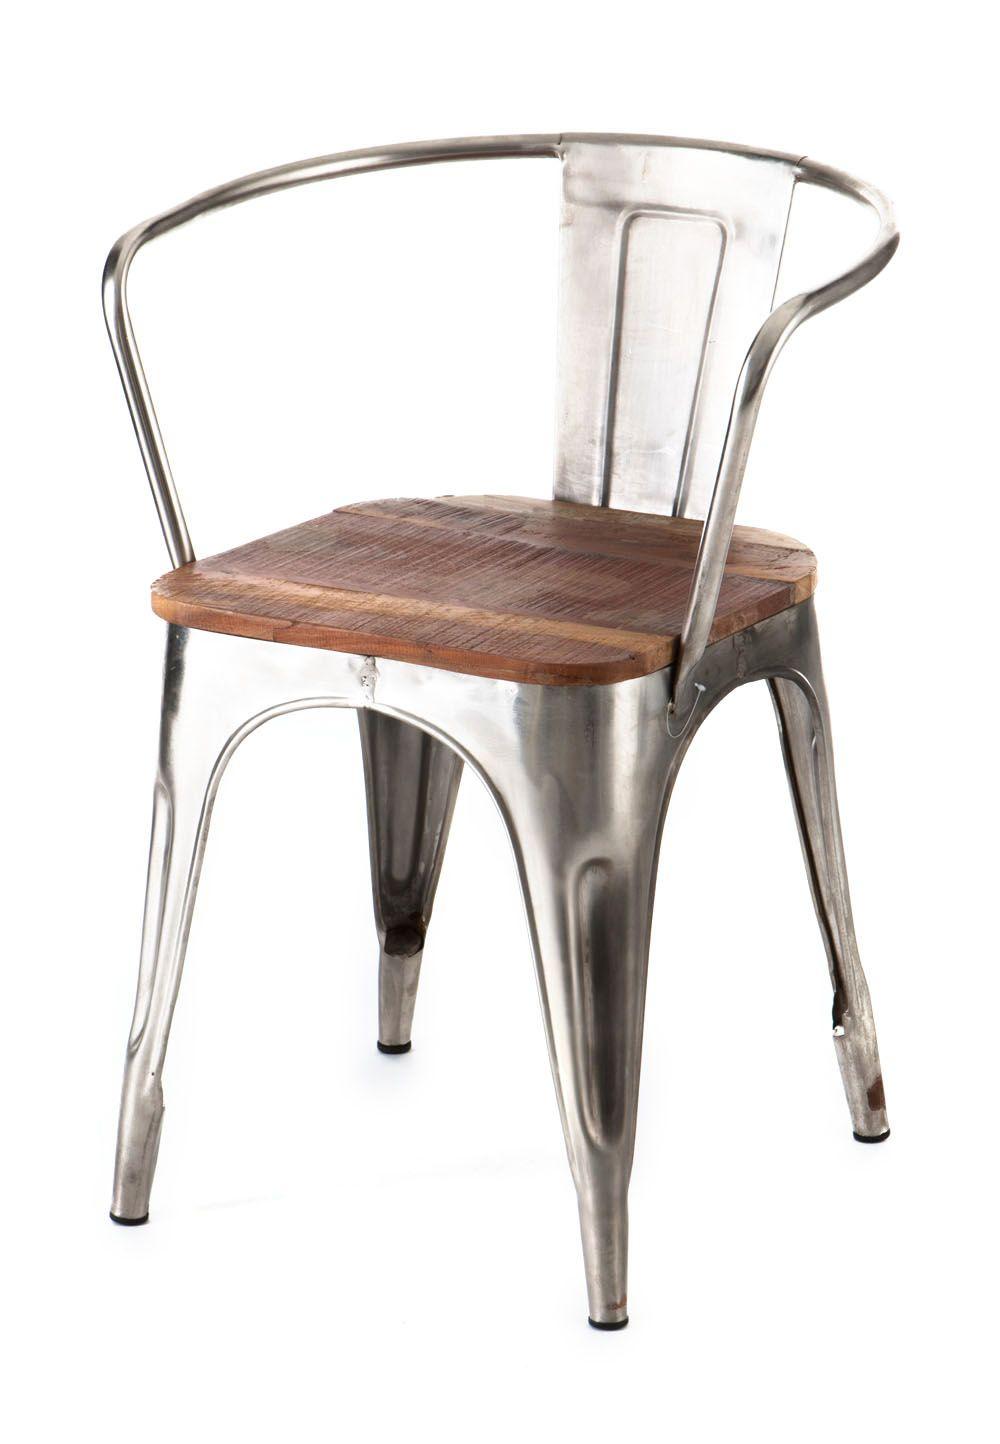 NovitÀ Home Stuhl Metall B38 X H70 X T38 Cm Günstig Shoppen Stühle Shoppen